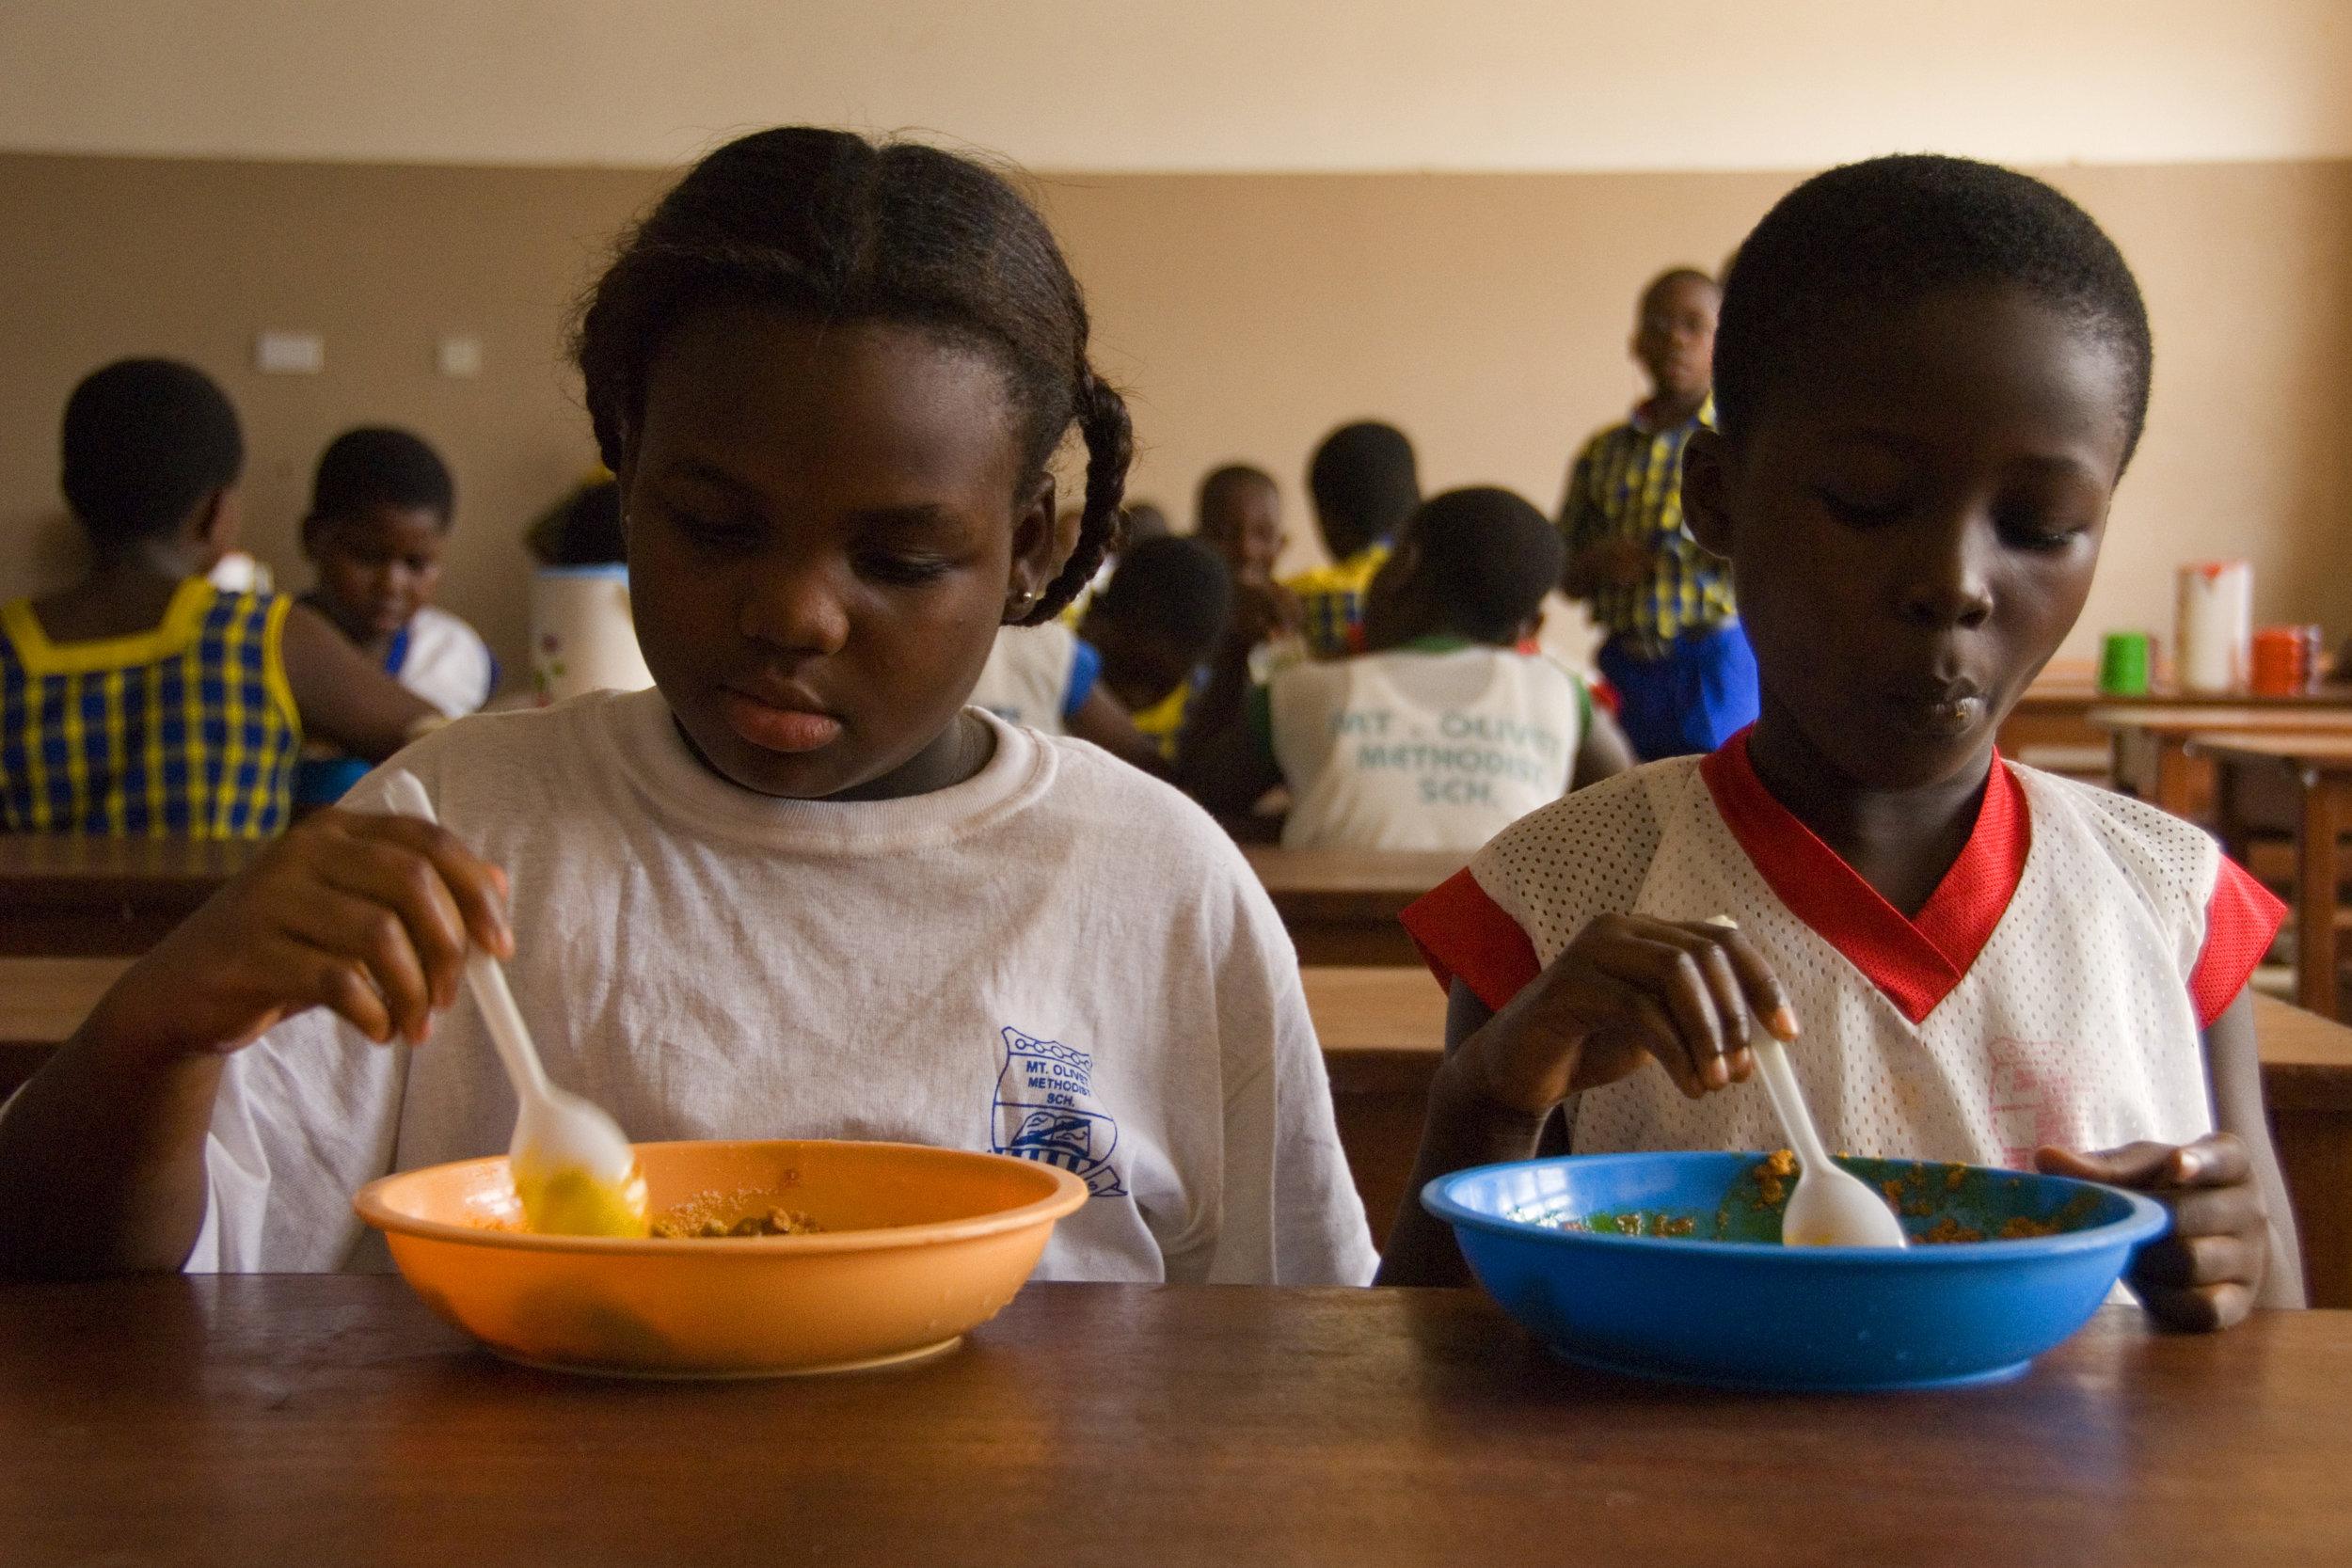 School meal_WB photo.jpg